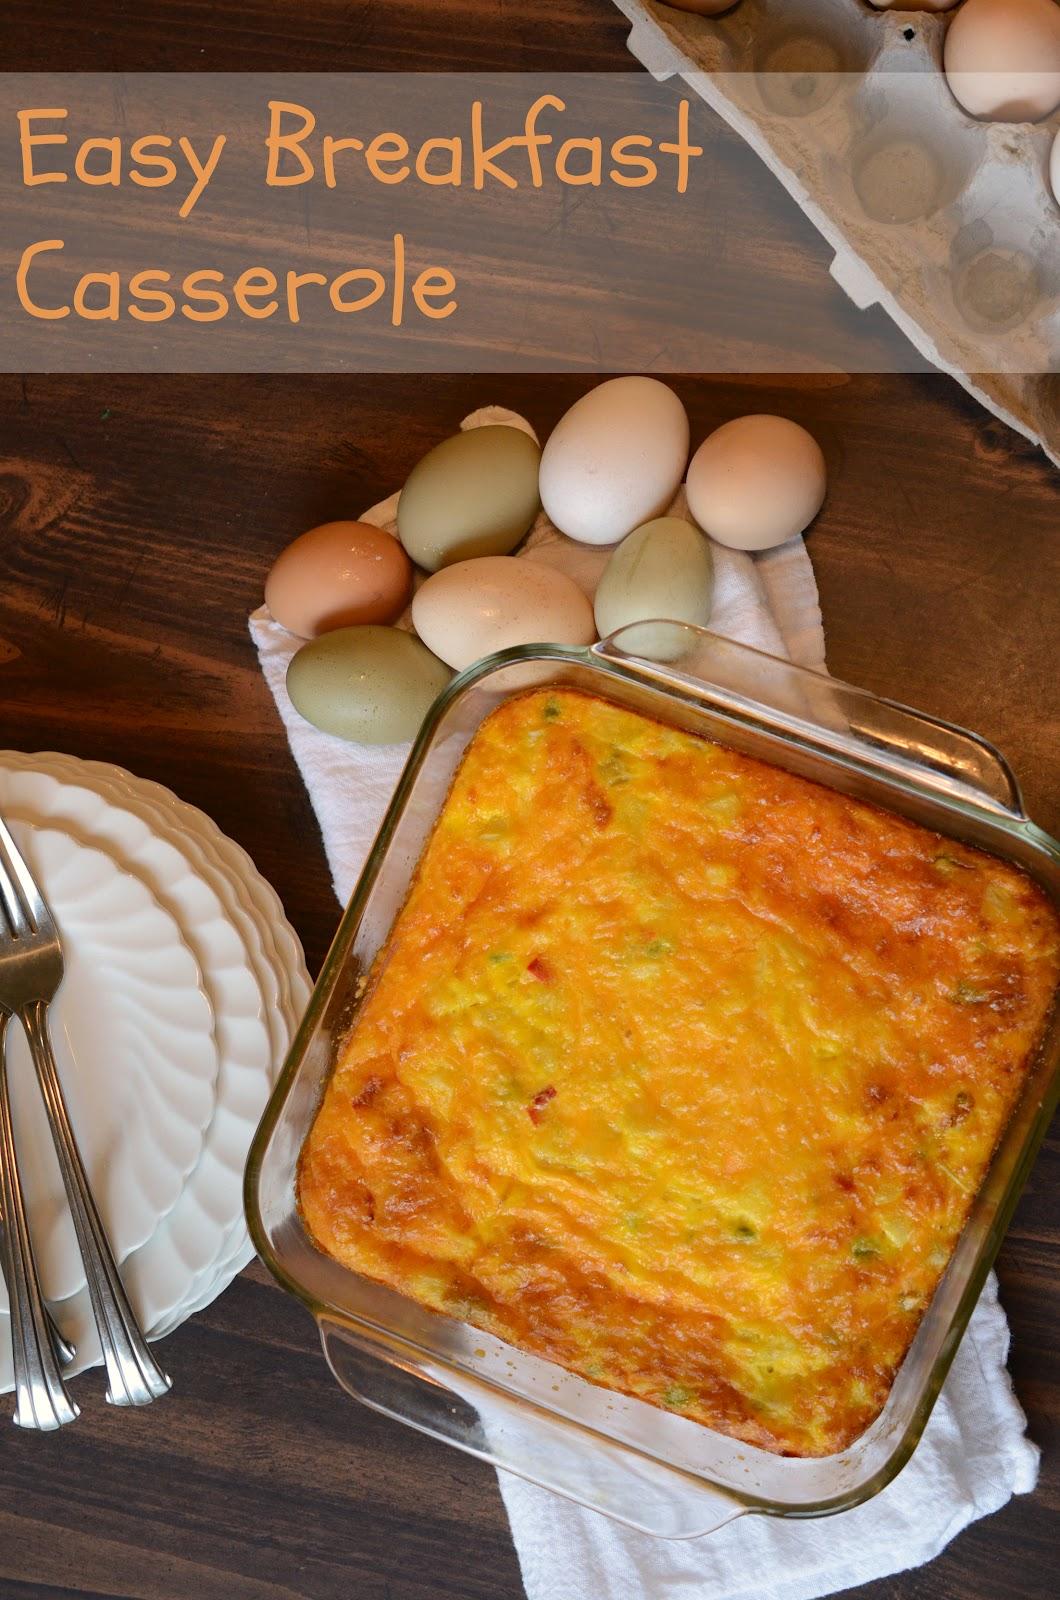 Easy Egg And Potato Breakfast Casserole